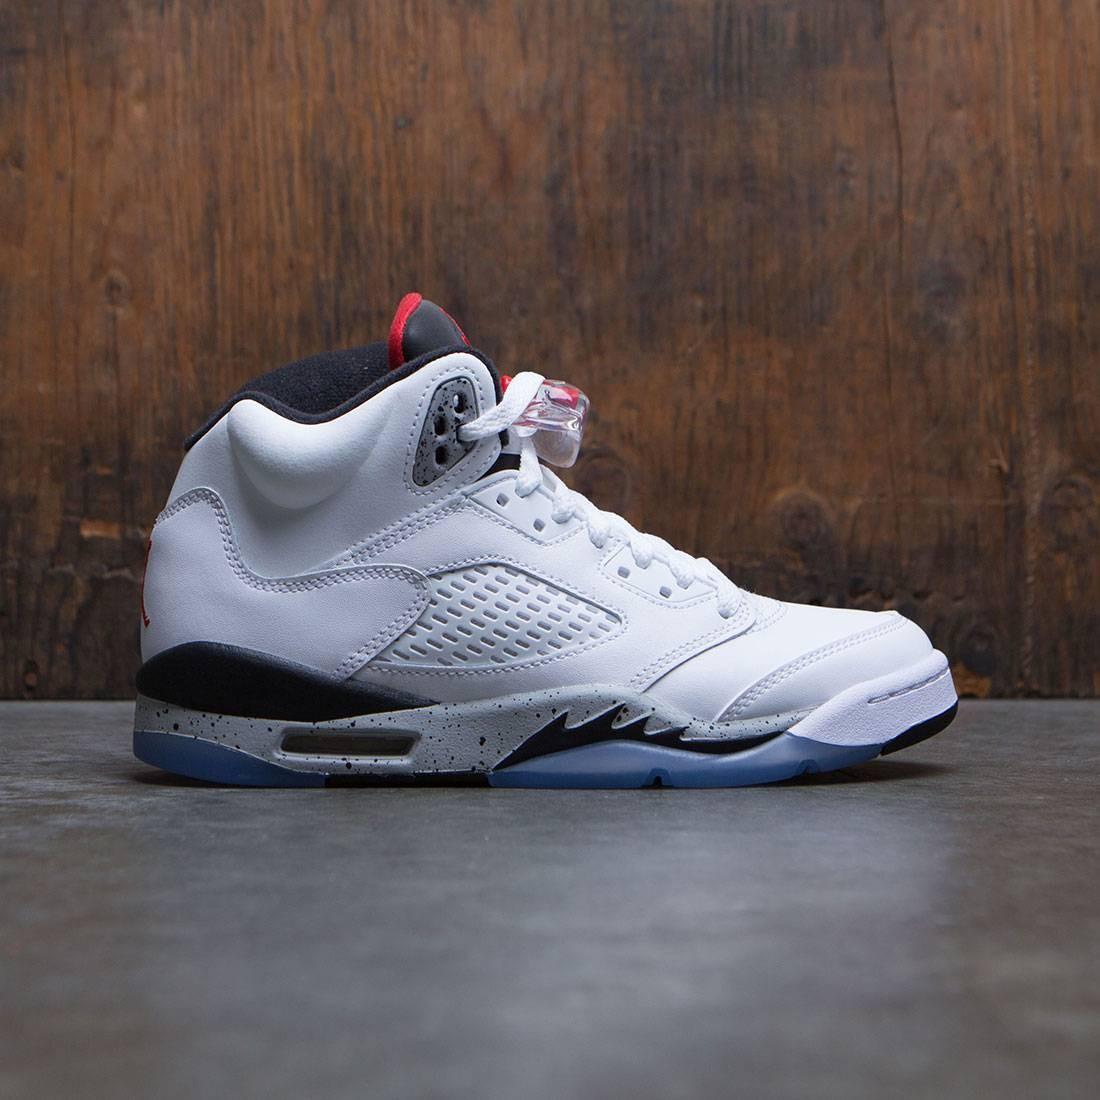 outlet store 5383a 67631 ... inexpensive find sneaker 16ad8 61cf9 air jordan 5 retro gs big kids  white university 37ad3 09de9 ...